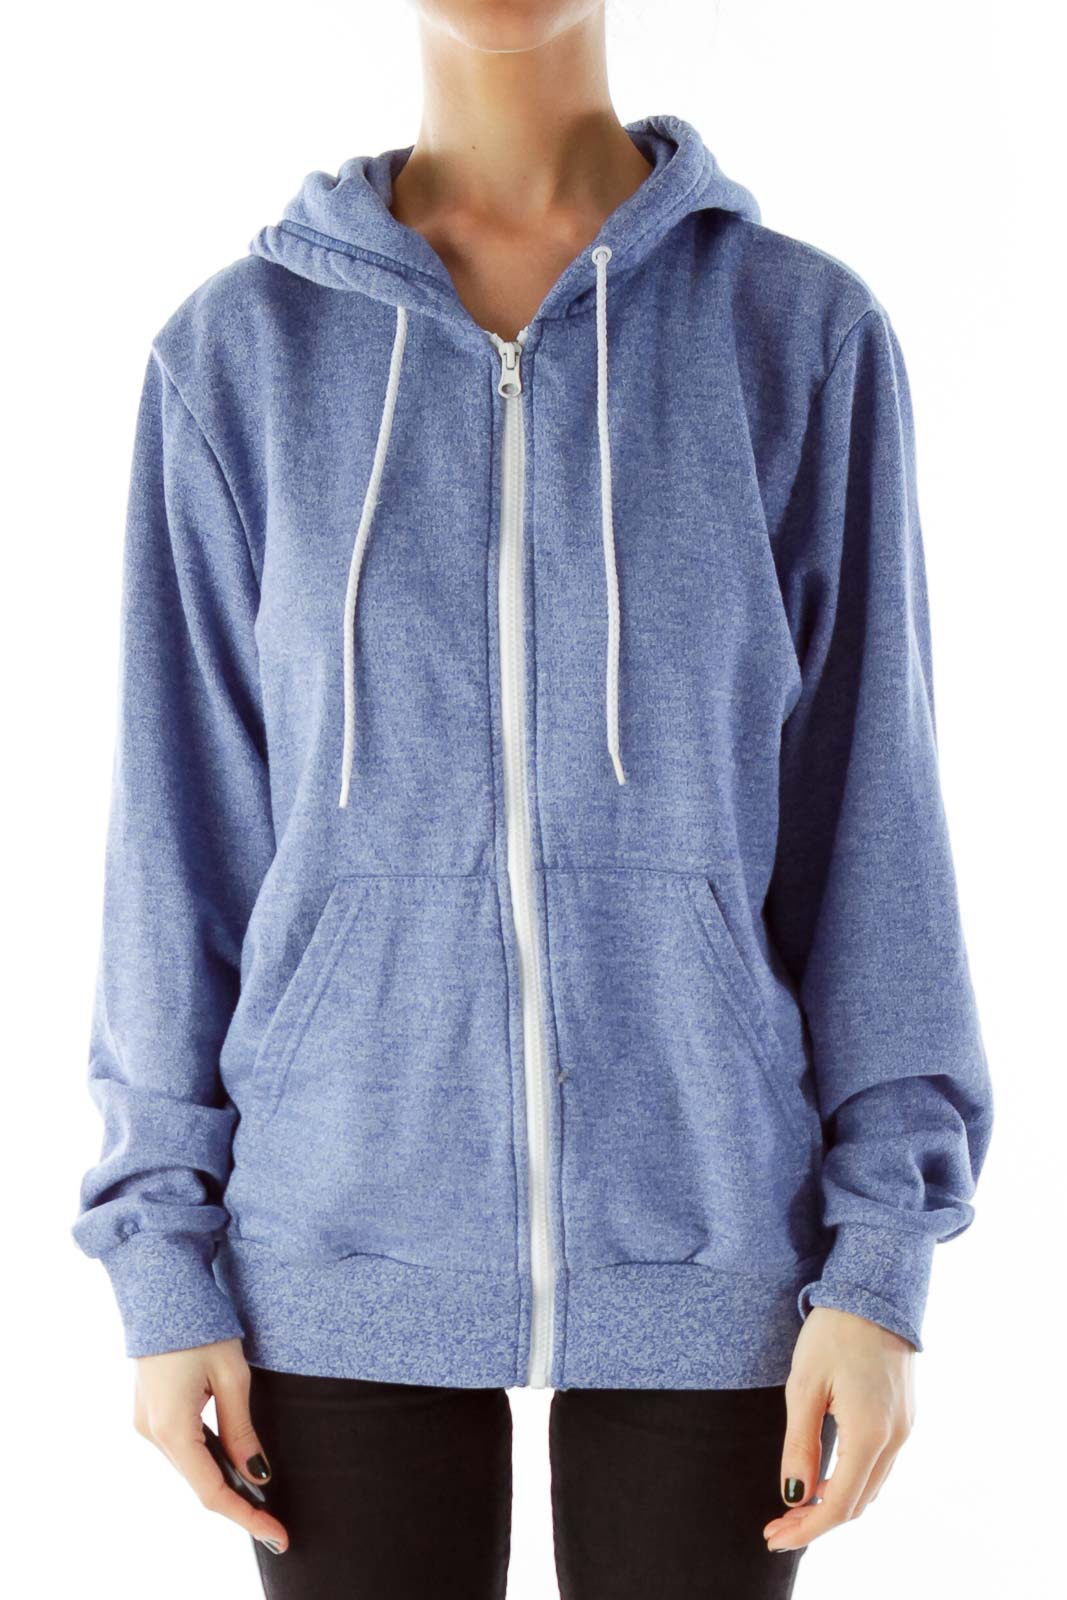 Blue Zippered Jacket